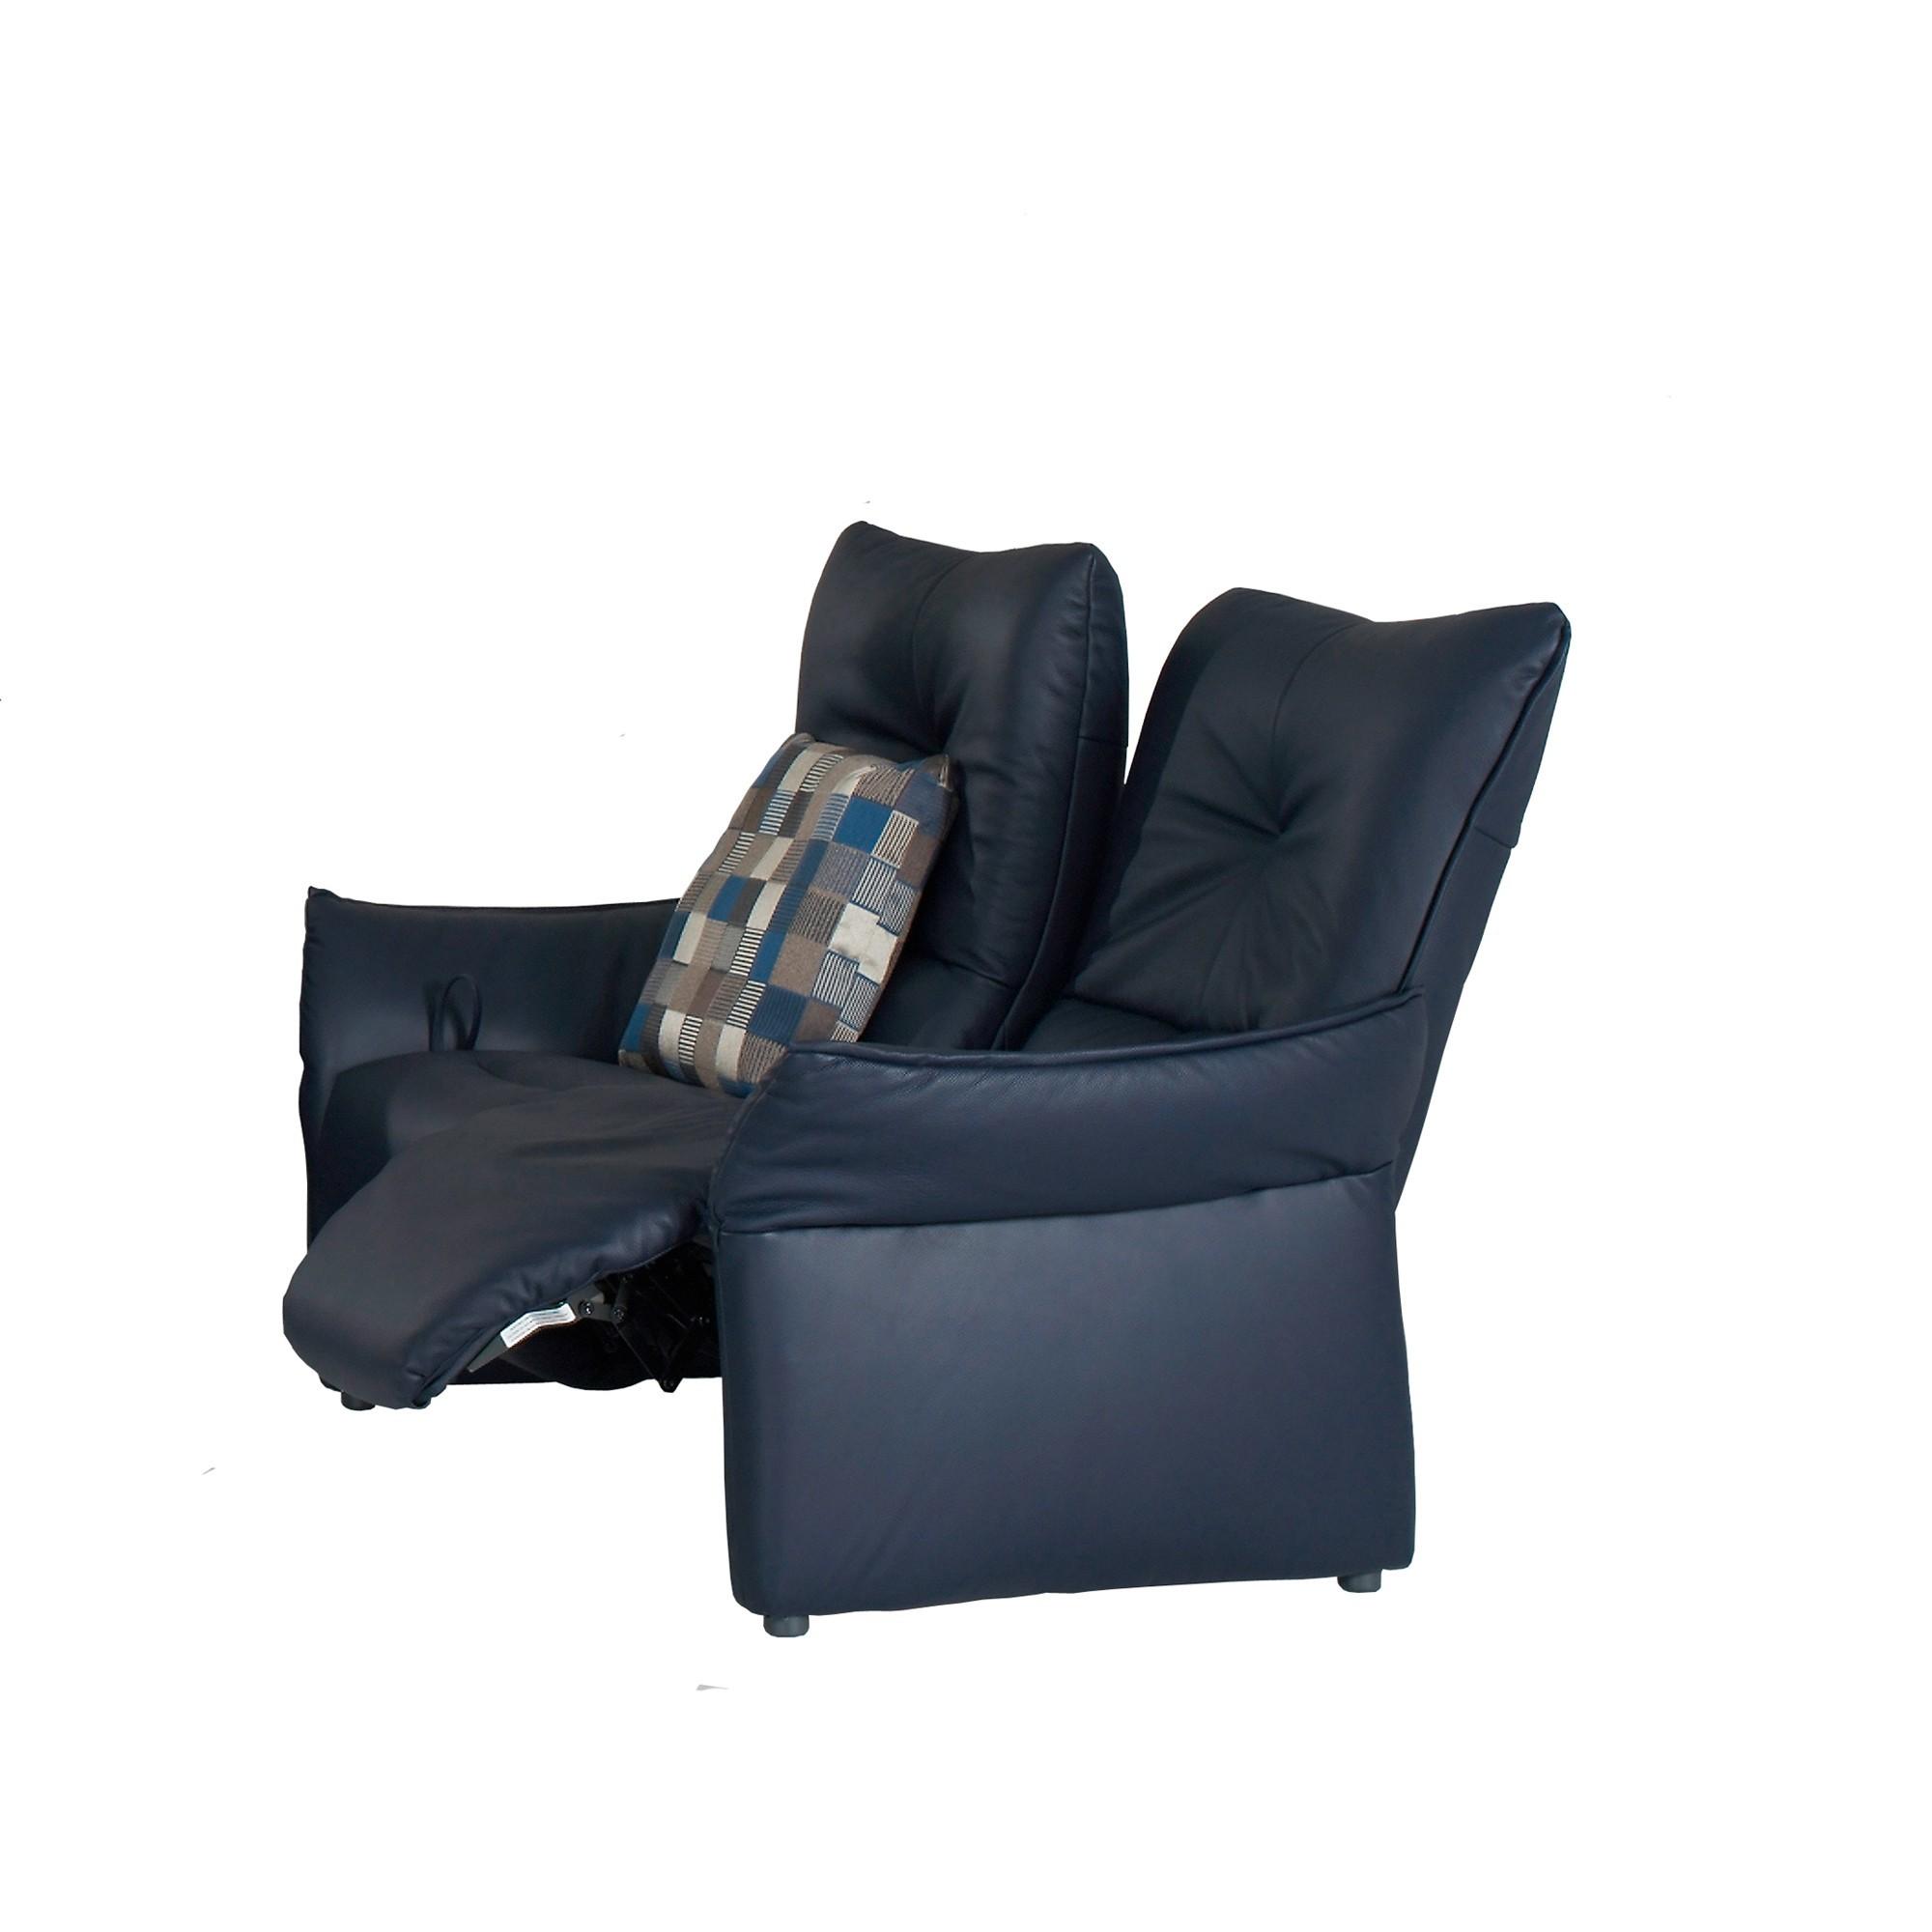 Himolla Brent 2 Seater Power Recliner Sofa Himolla